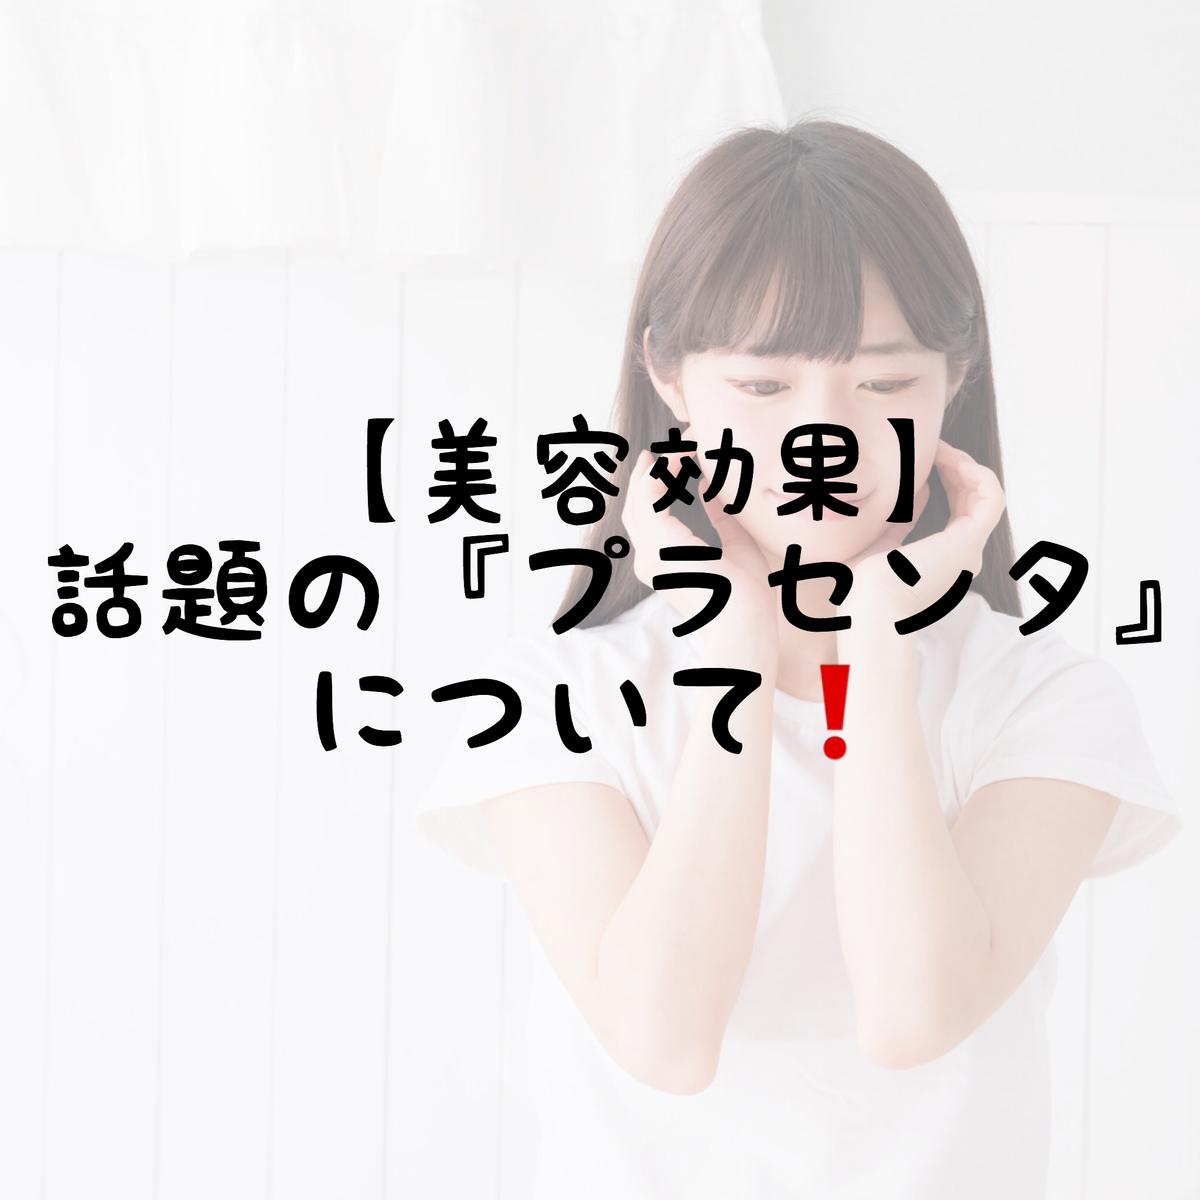 f:id:nokonoko_o:20200517150233j:plain